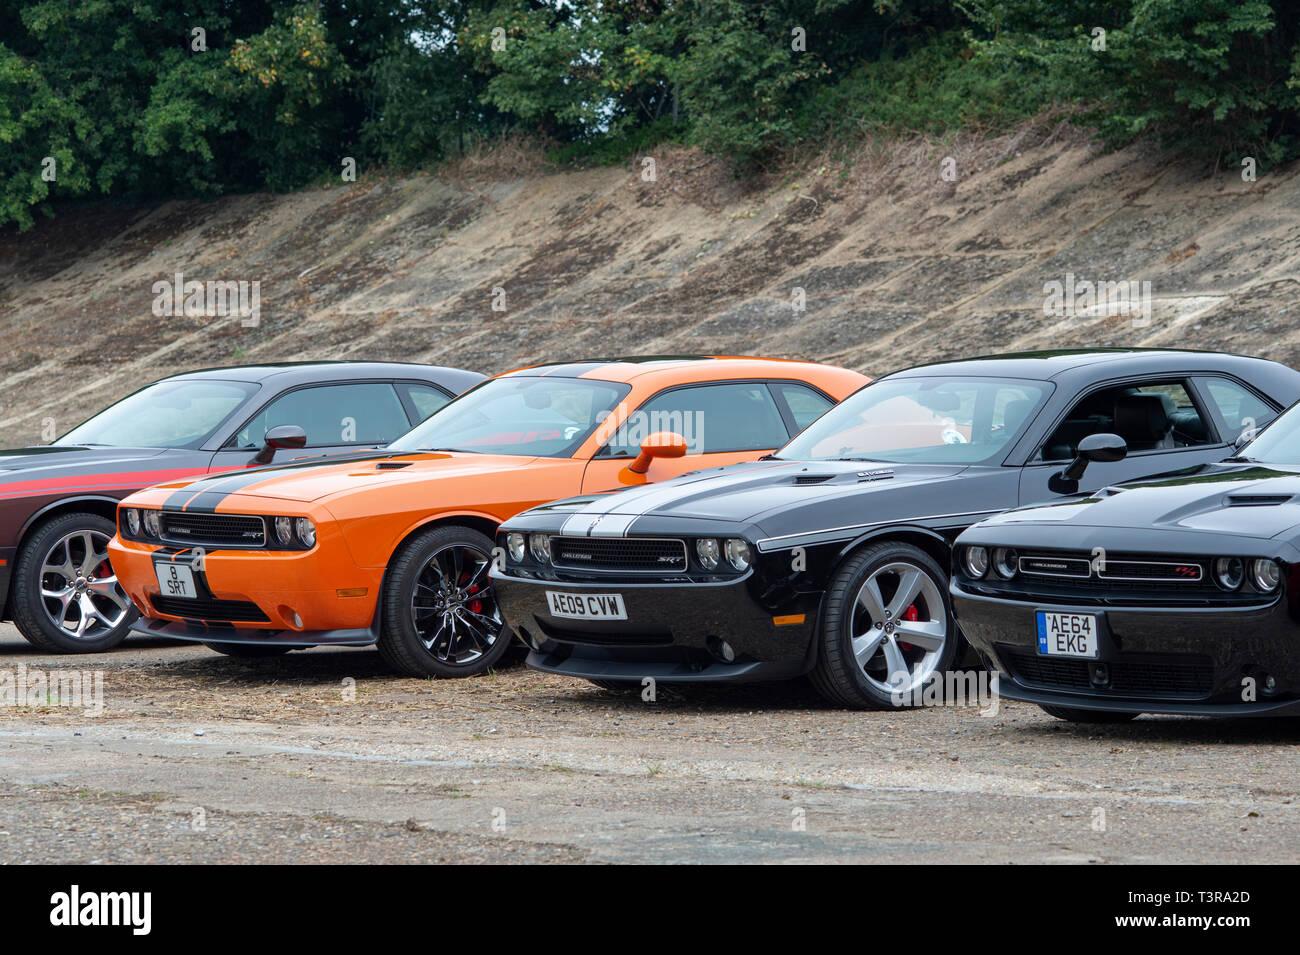 Dodge challenger SRT Cars at Brooklands, Weybridge, Surrey, England Stock Photo